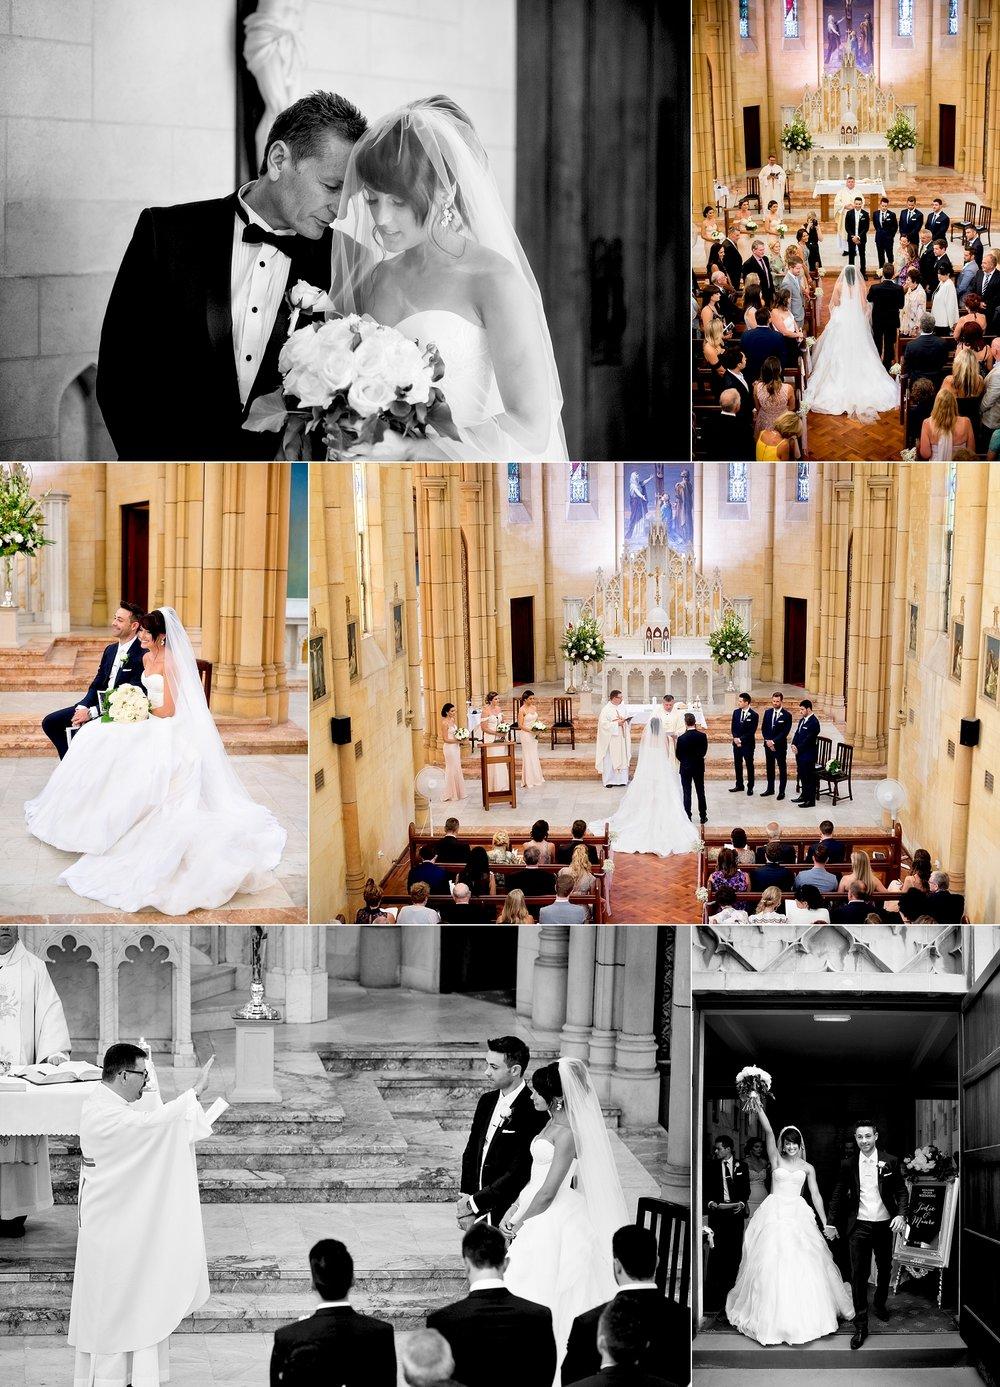 st michaels the archangel catholic wedding perth